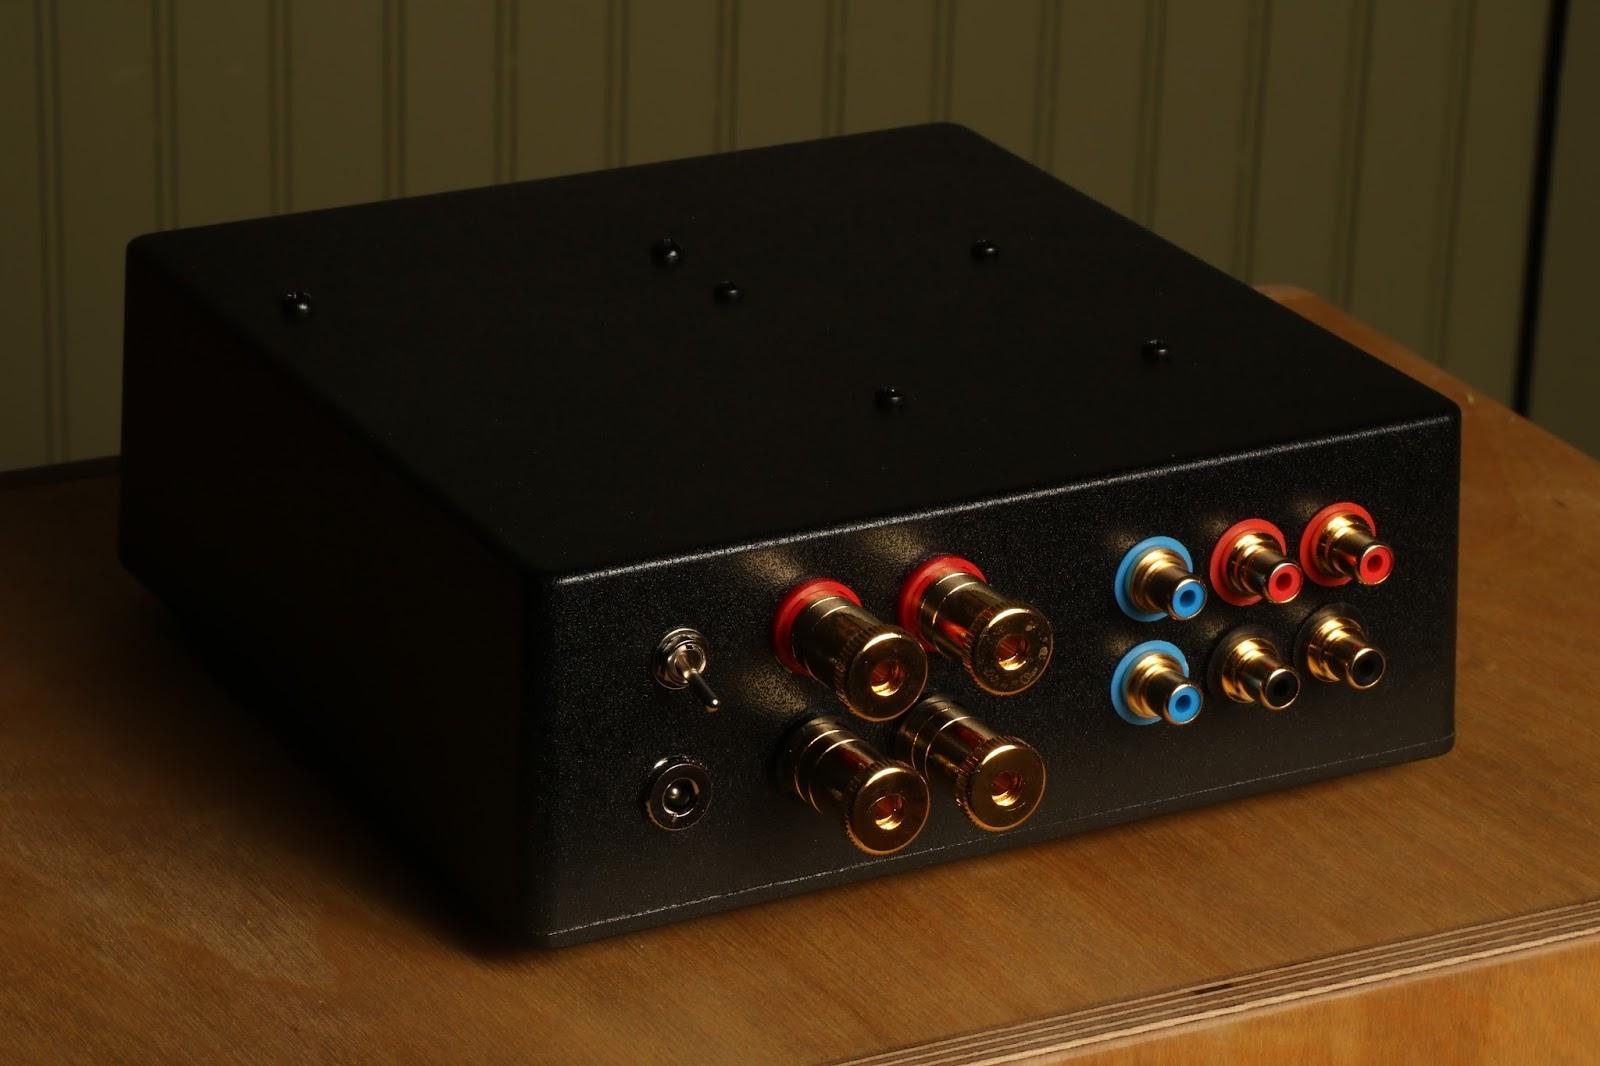 Fleawatt Class D Amplifier Circuit Tpa3116d2 Tpa3118d2 Subwoofer Nichicon Fine Gold Power Supply Capacitors Remote Control Volume